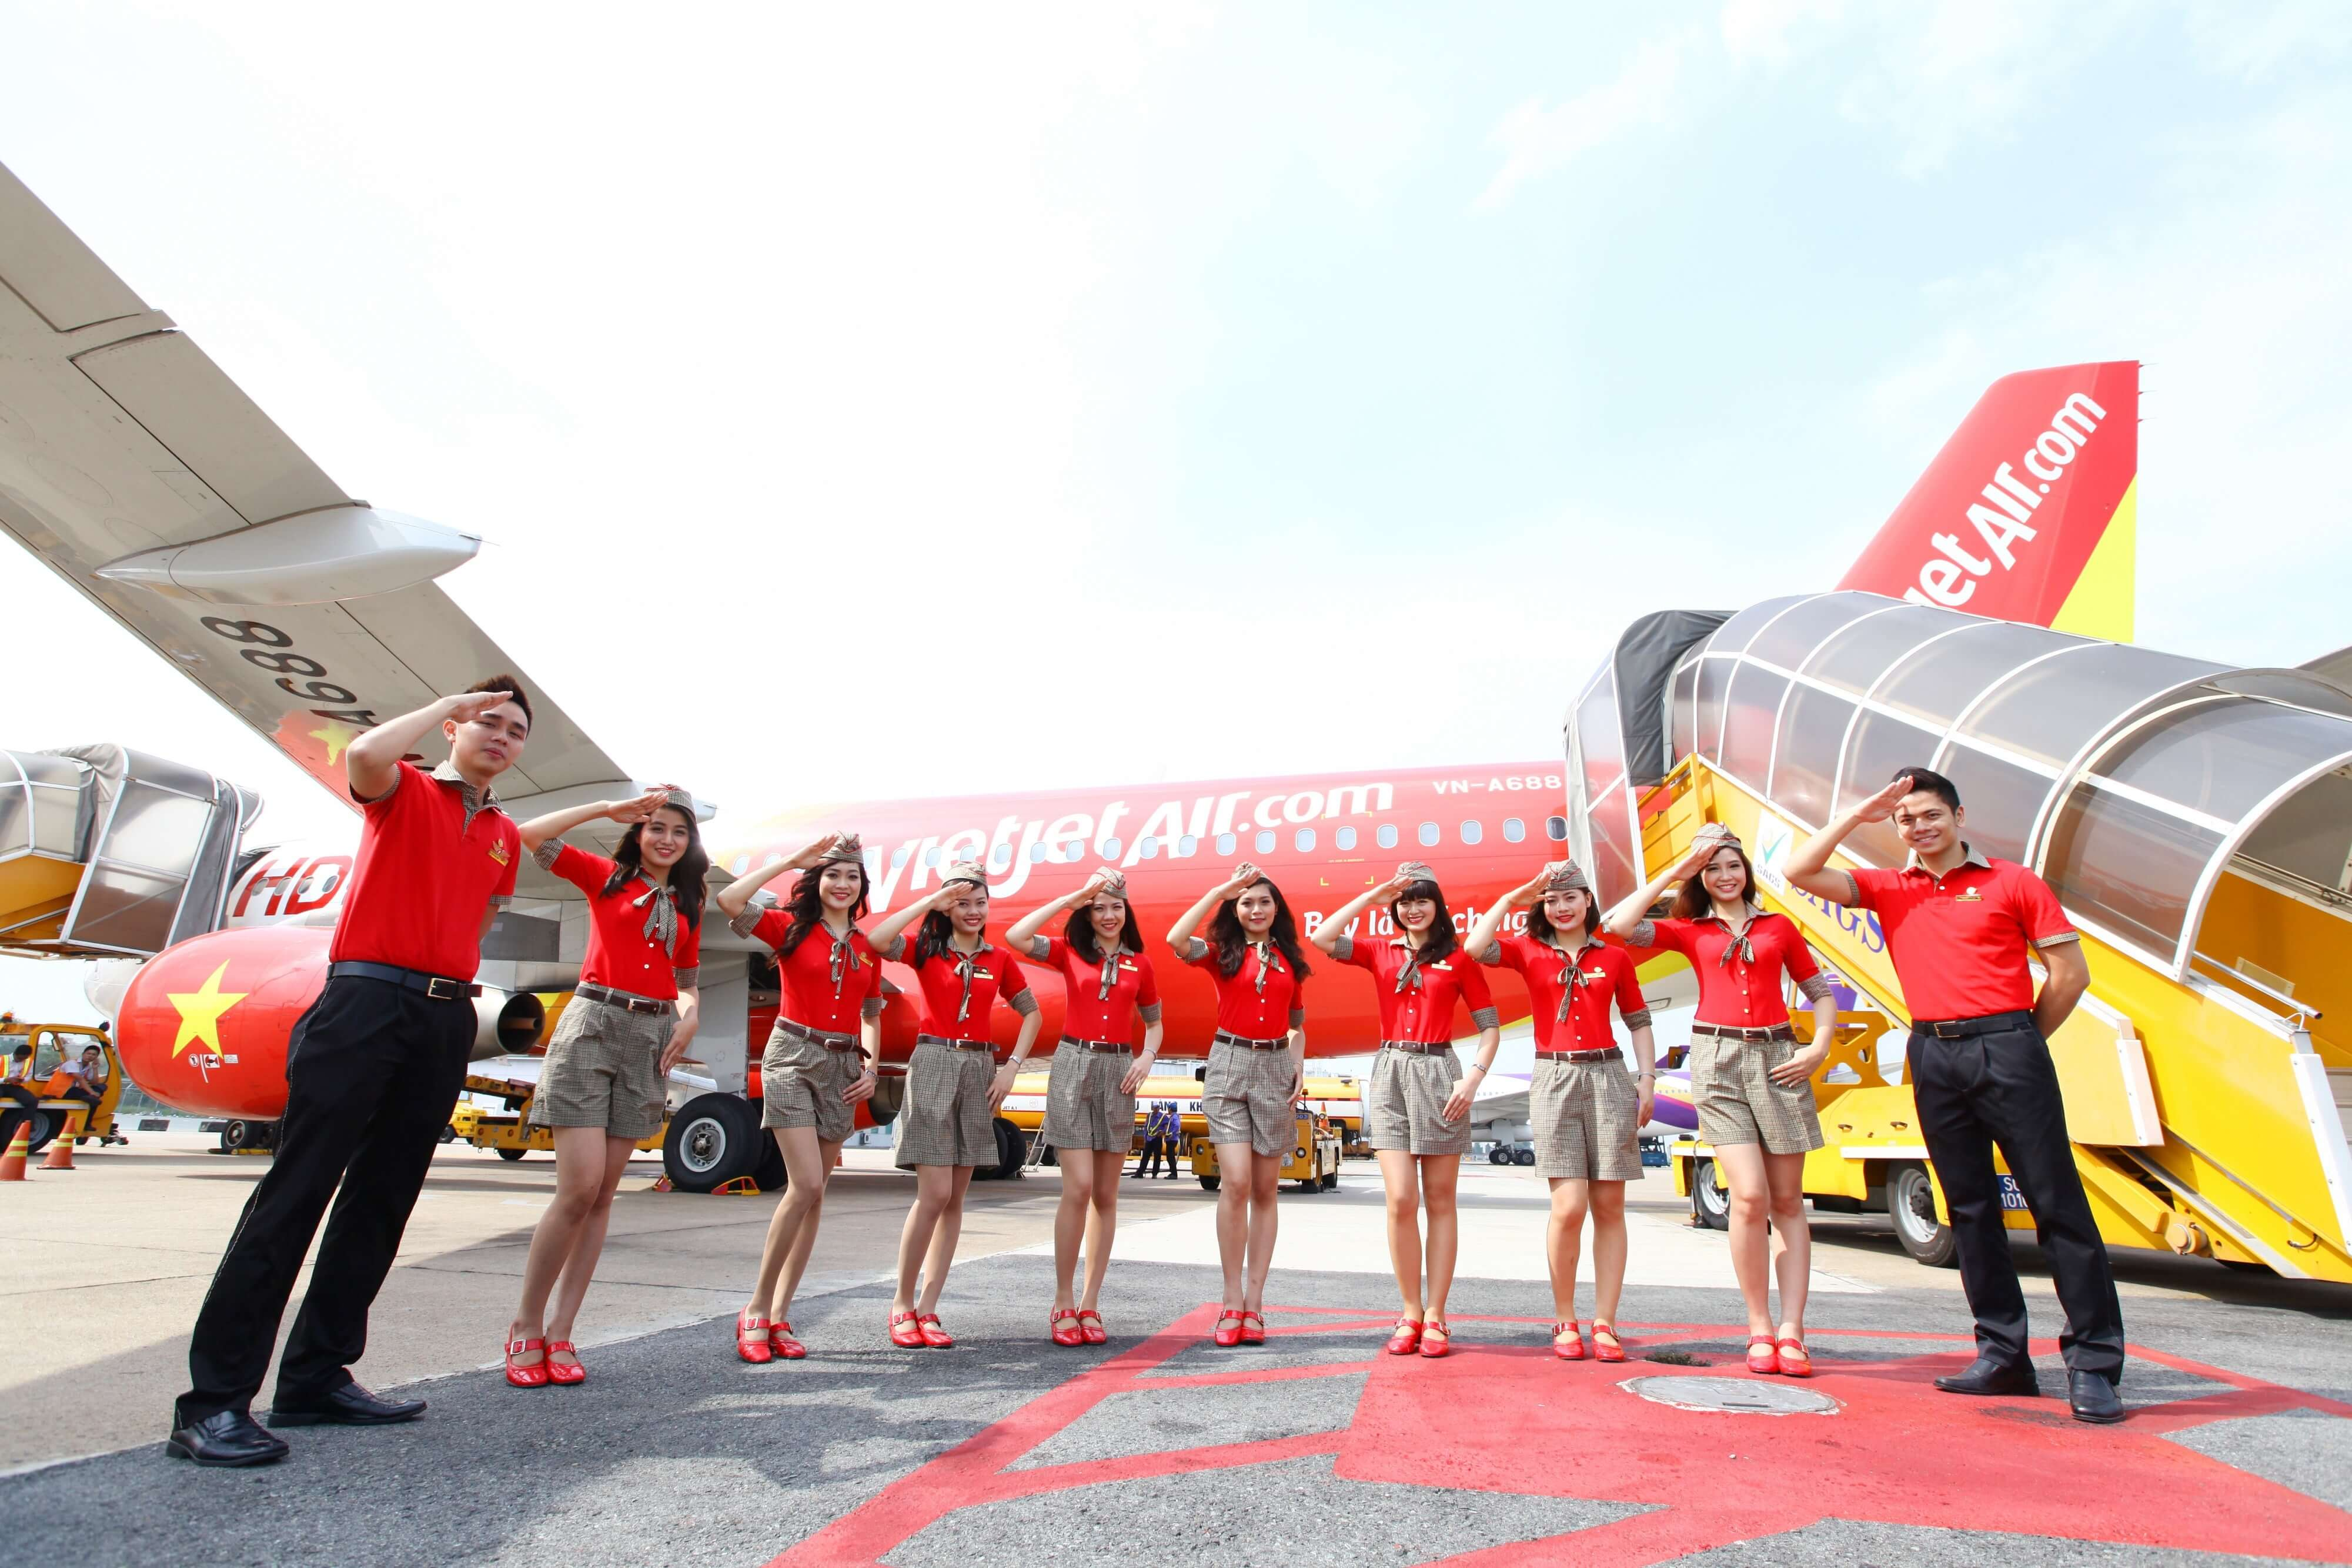 Vietjet: Remarkable growth despite bustling Vietnamese aviation market